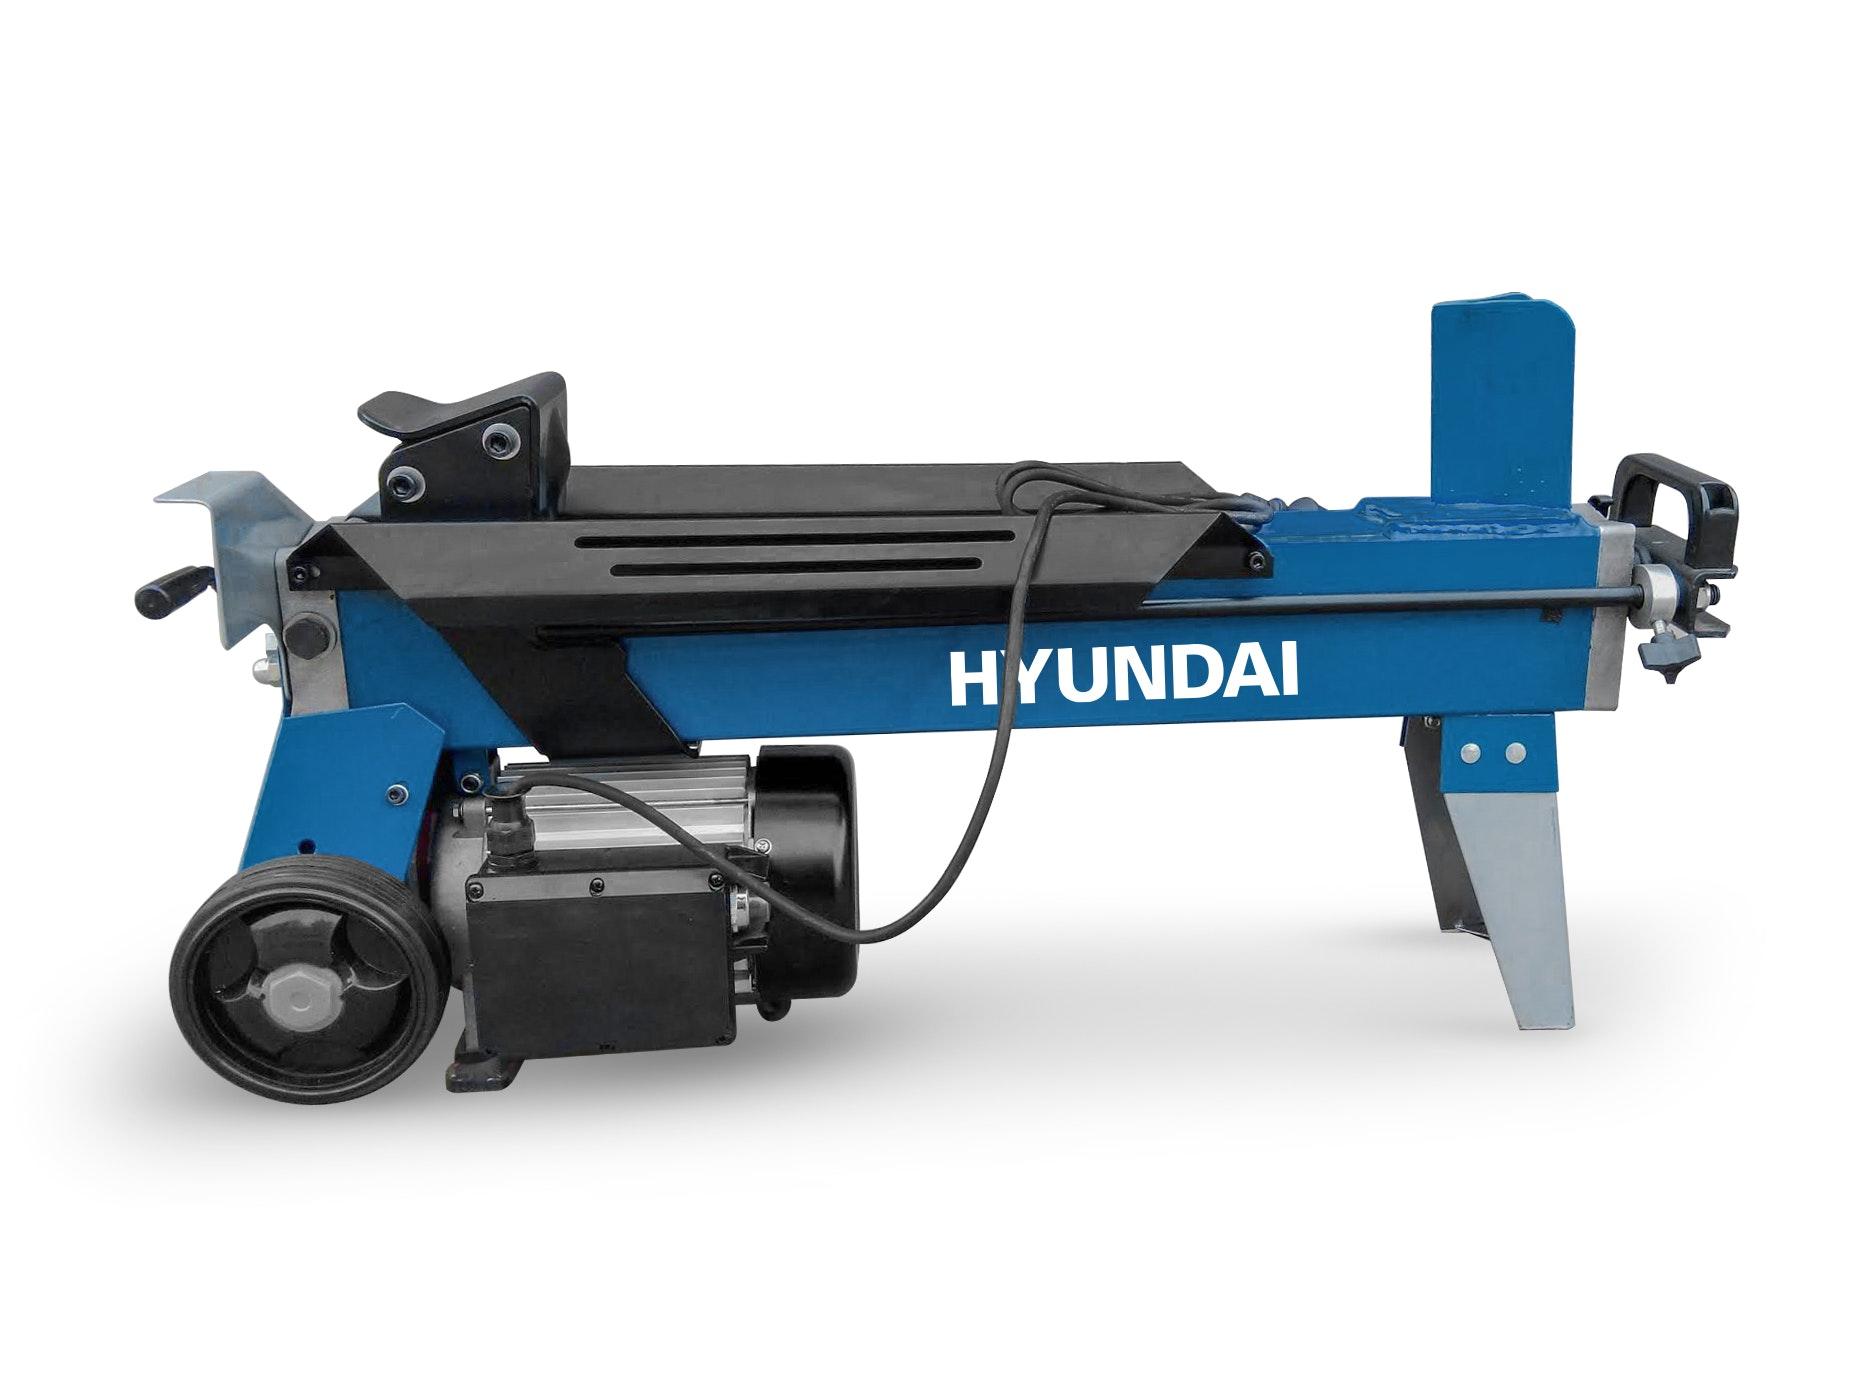 Hyundai Log Splitter 6T Electric